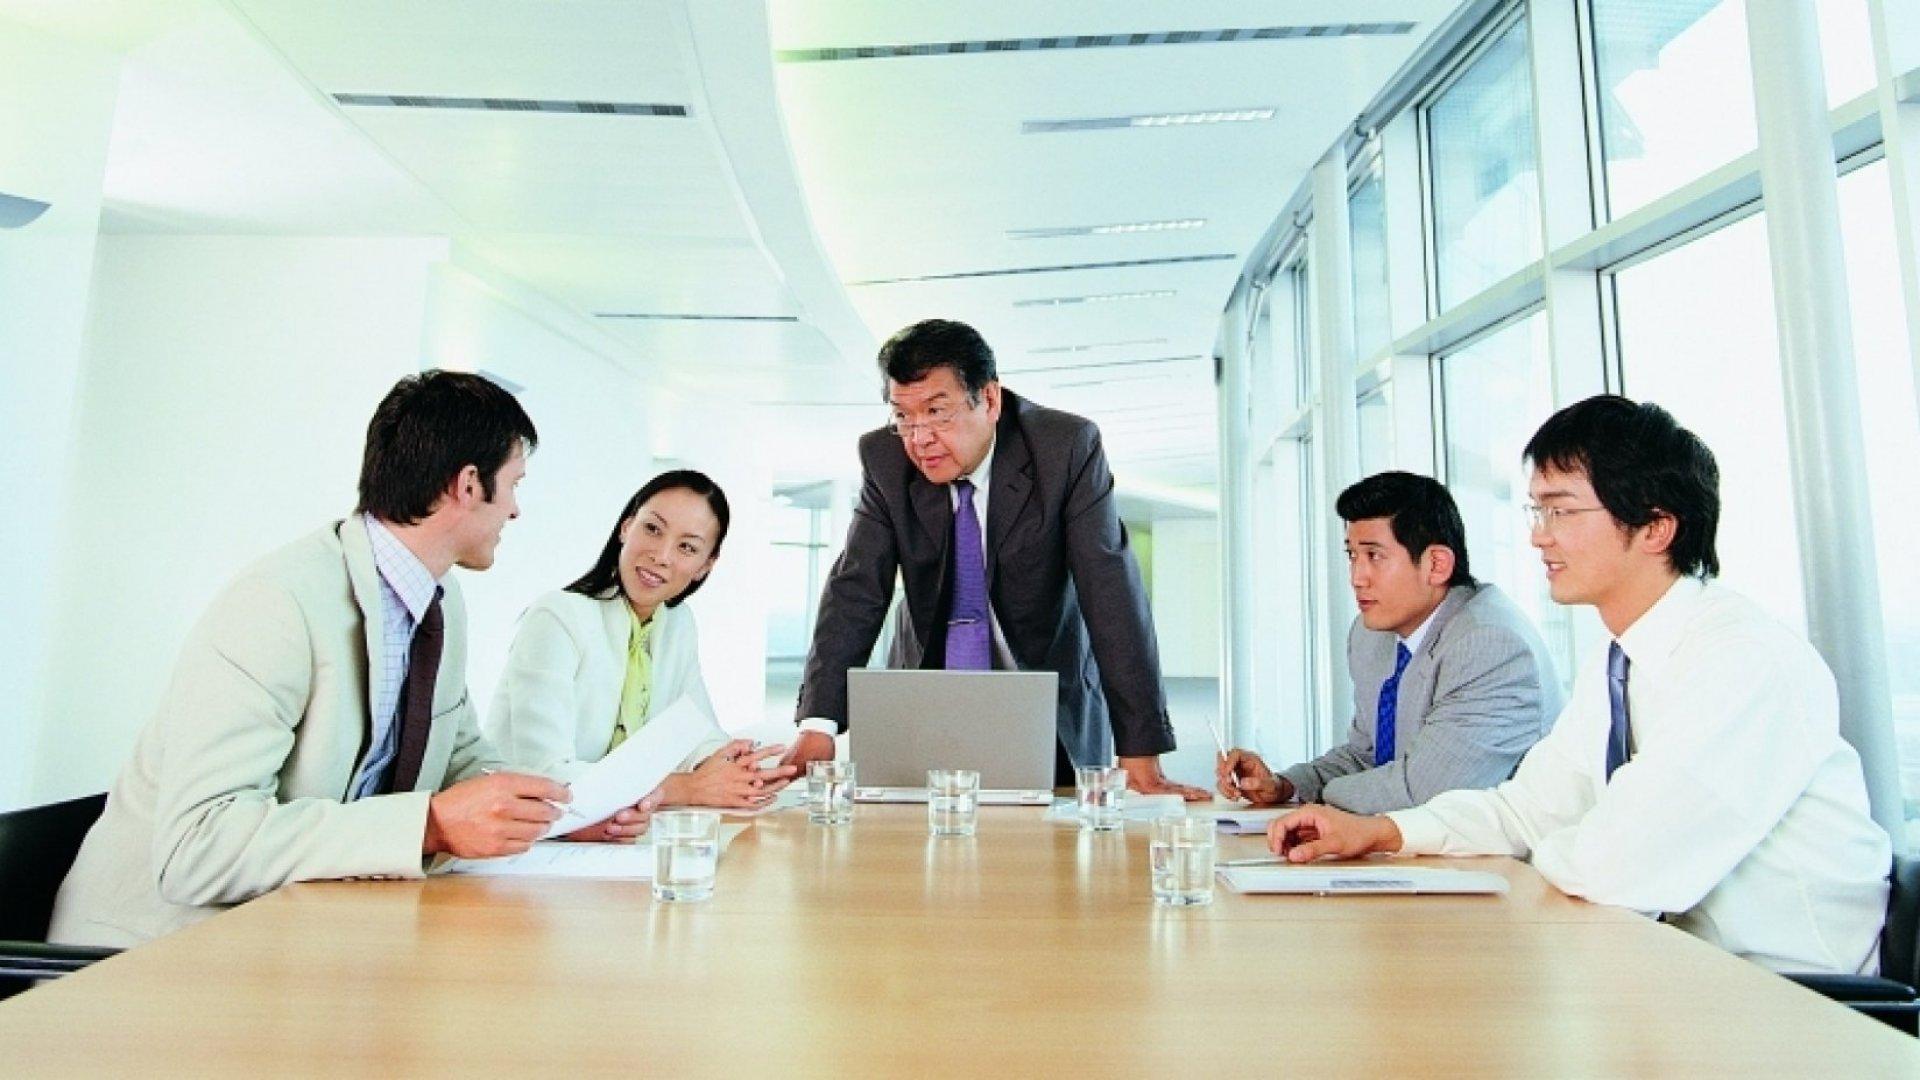 8 Ways a Leader's Behavior Impacts the Bottom Line